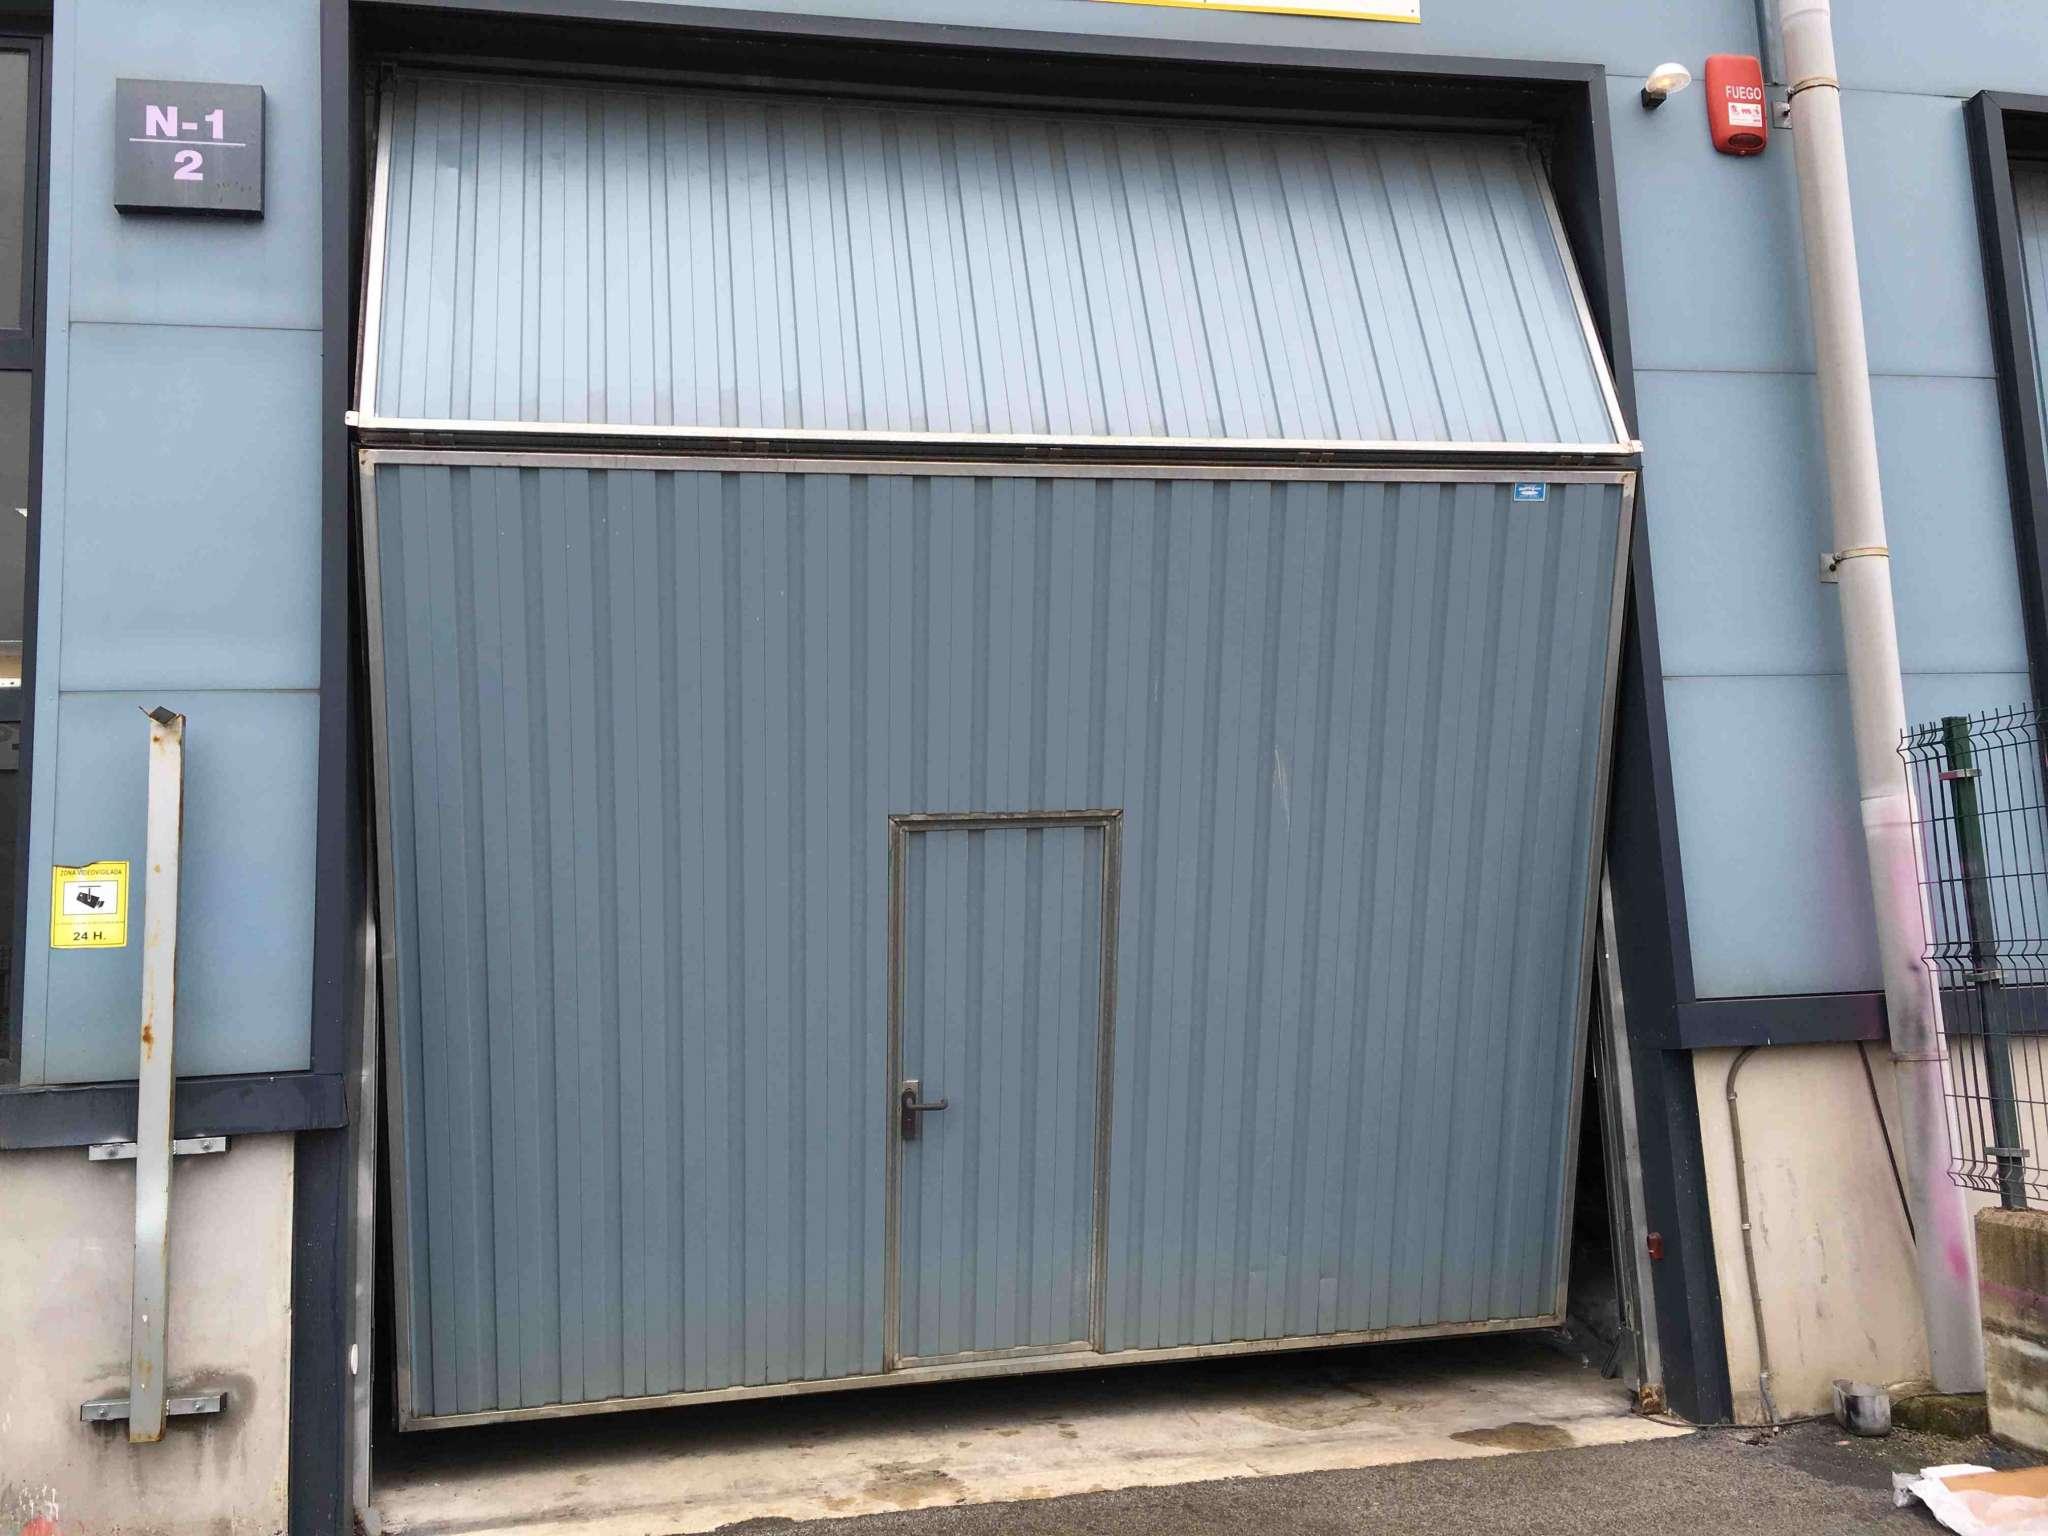 Puertas garaje basculantes precios latest puertas de - Motor puerta garaje basculante ...